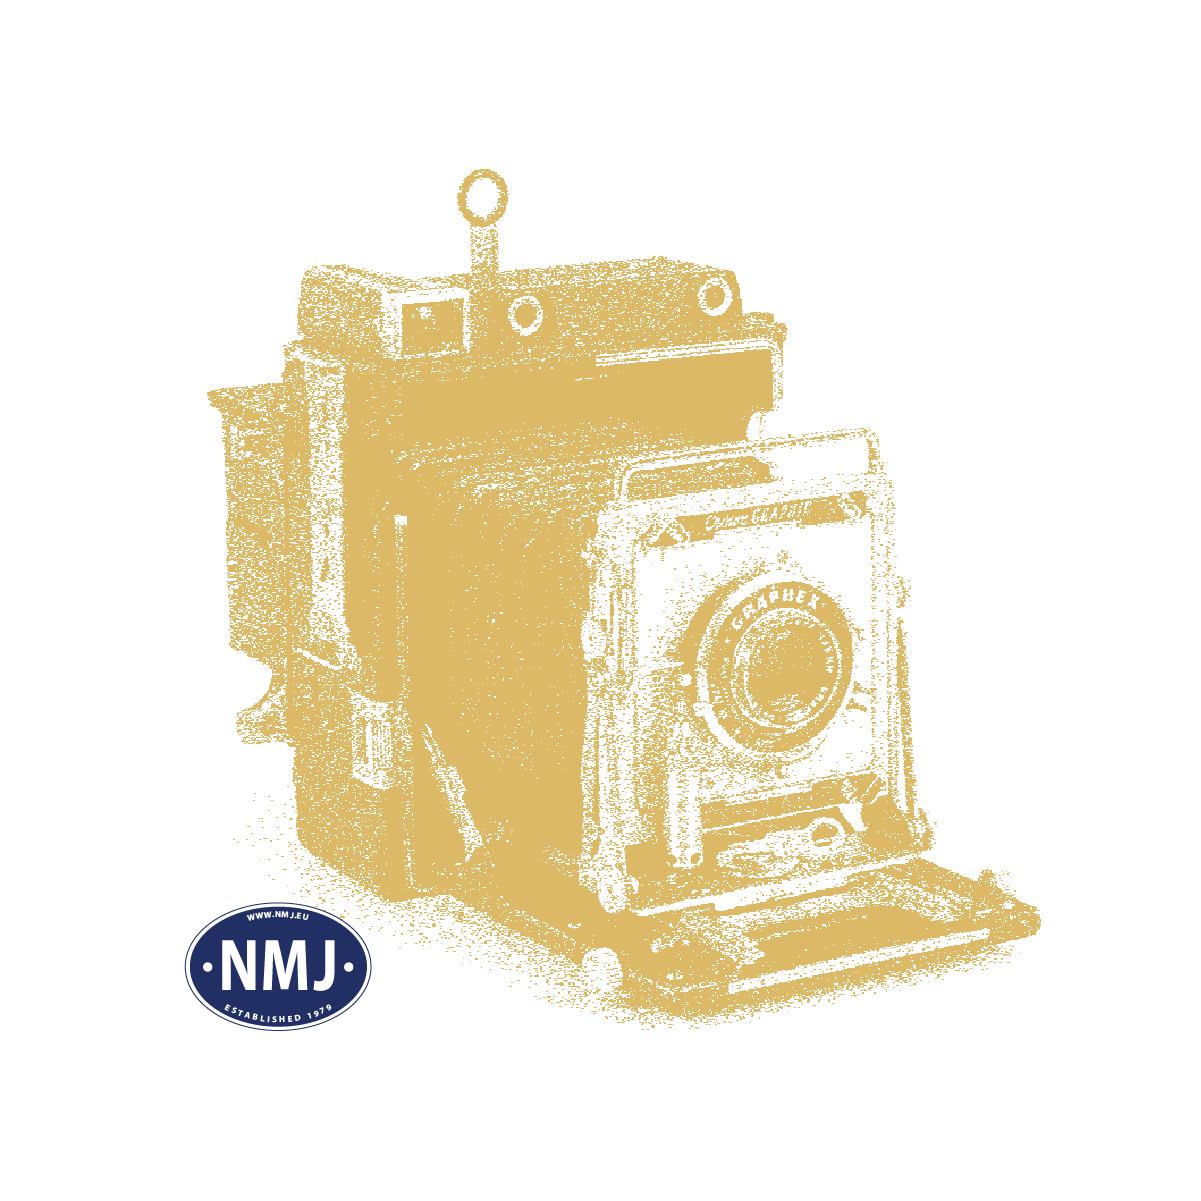 NMJT610.201 - NMJ Topline SJ Ibblps 820 0 372-4 Interfrigo